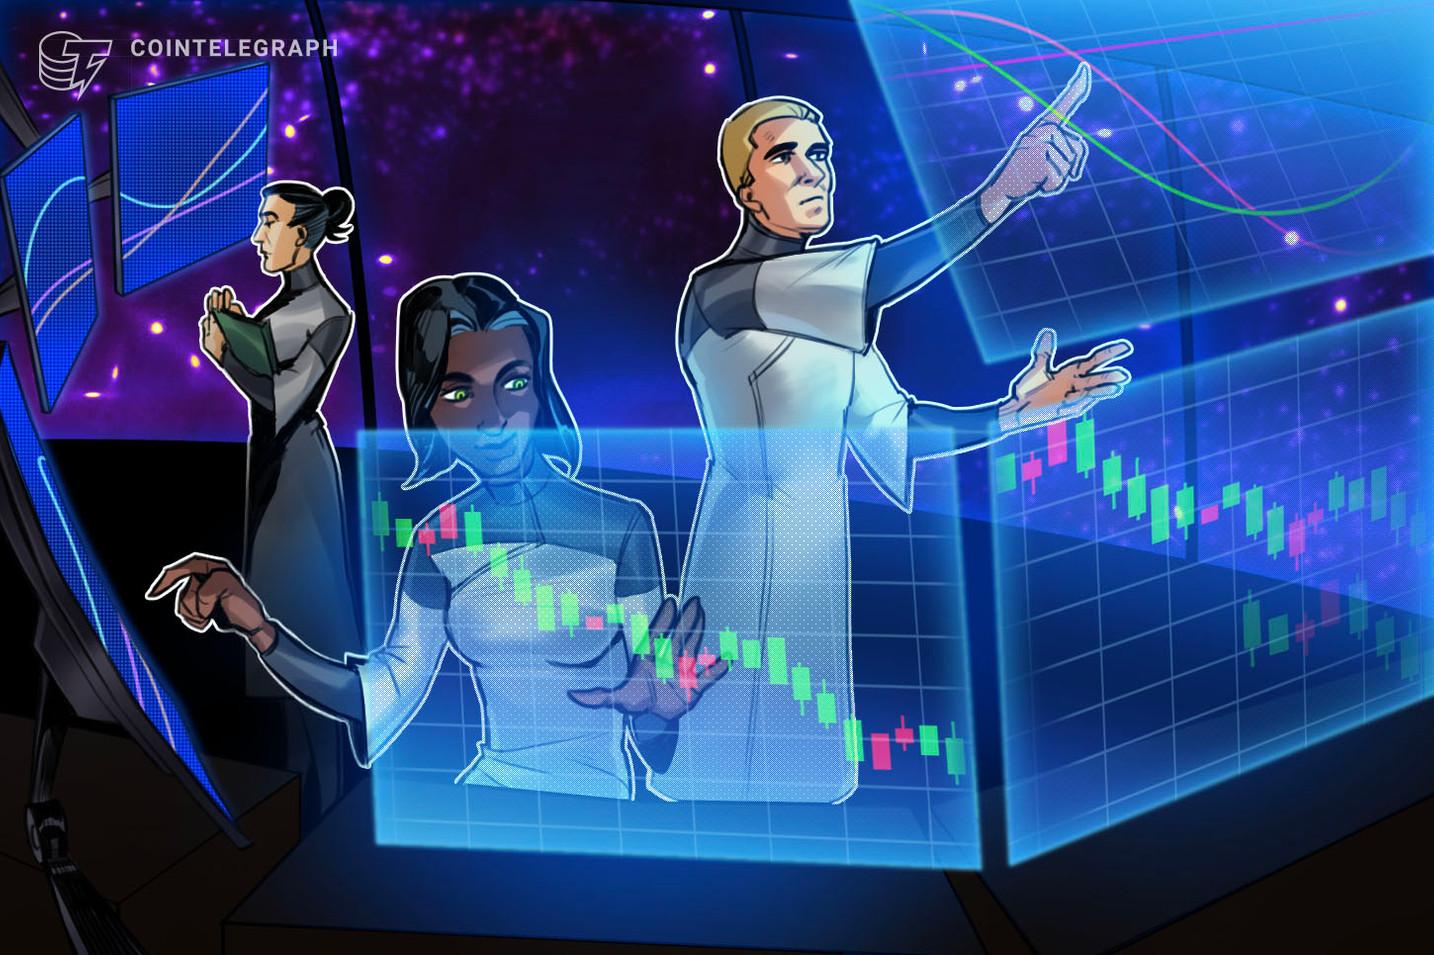 Binance Offers Token Rewards for Testing New Decentralized Platform